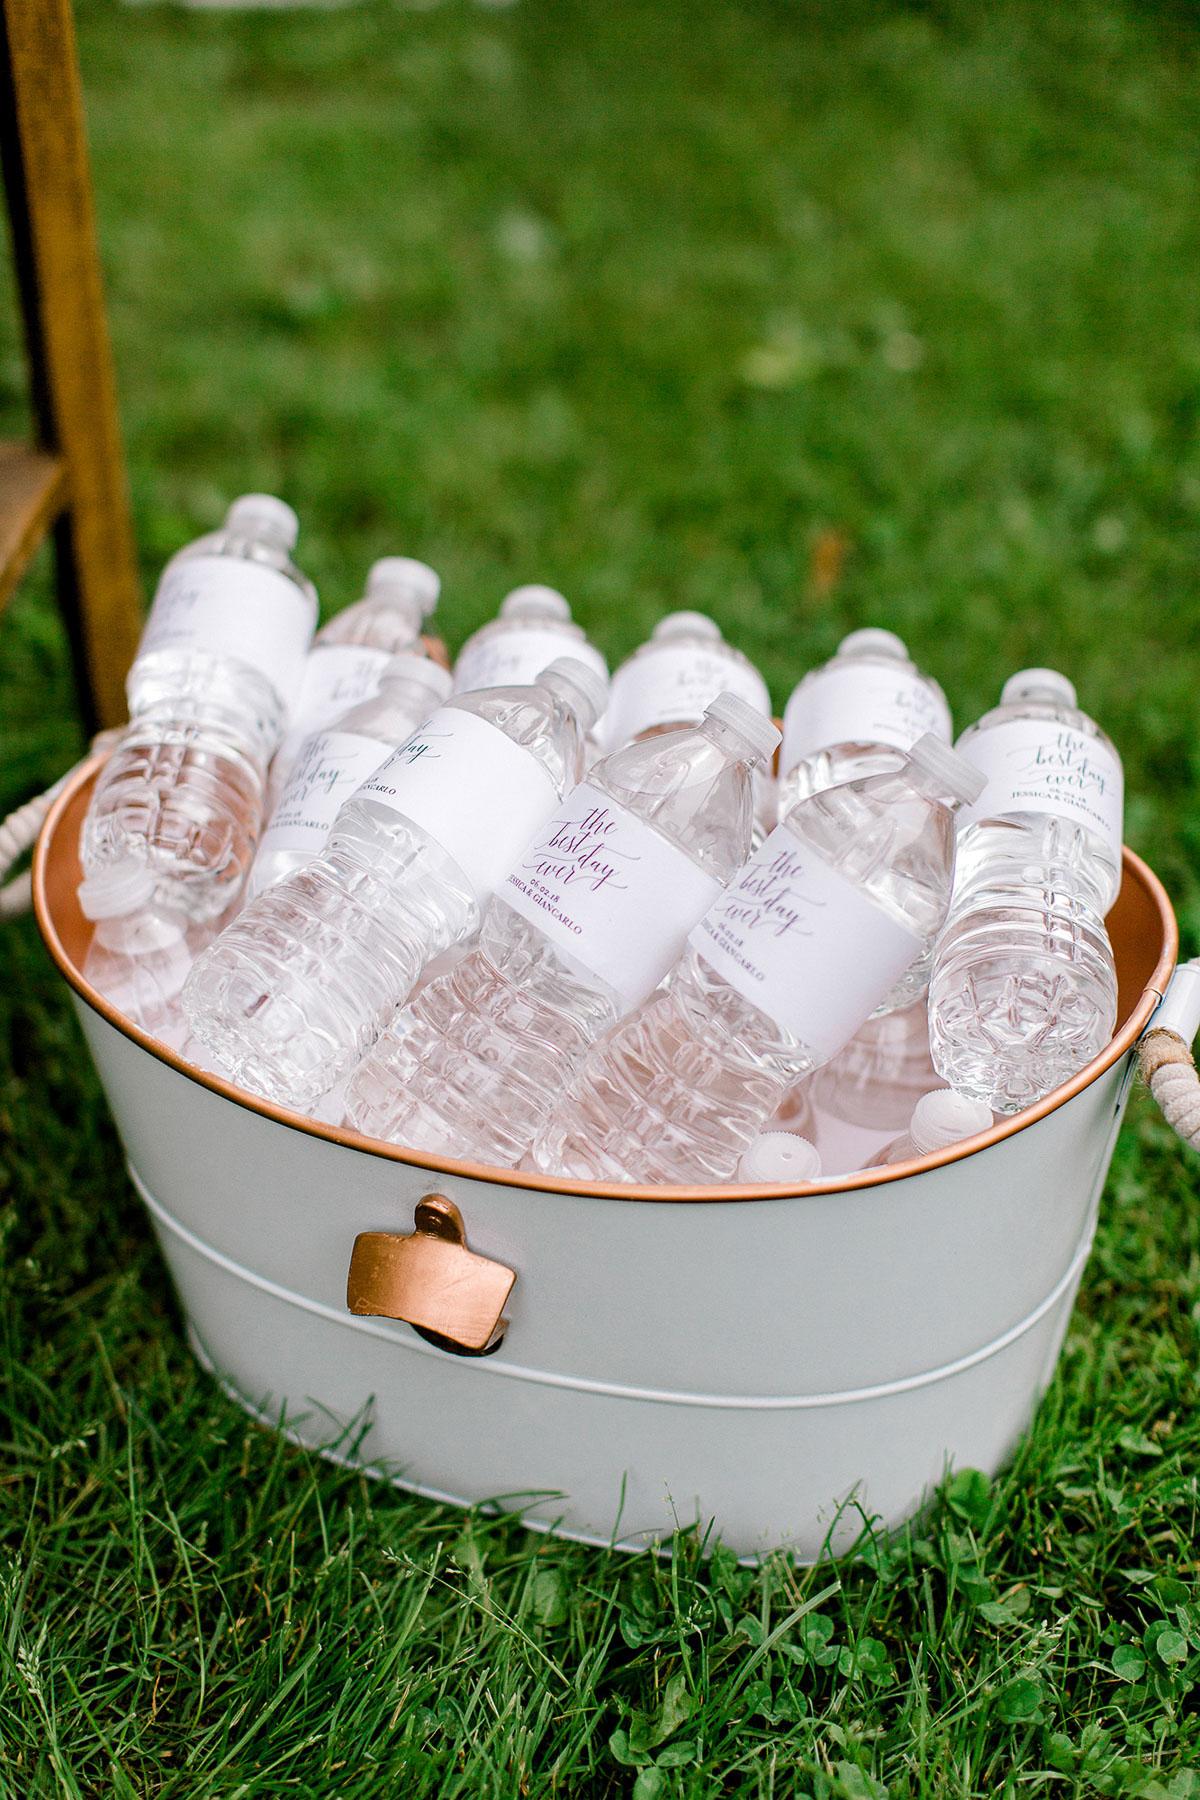 beatrice-elford-photography-vineyard-bride-swish-list-balls-falls-vineland-wedding-45.jpg